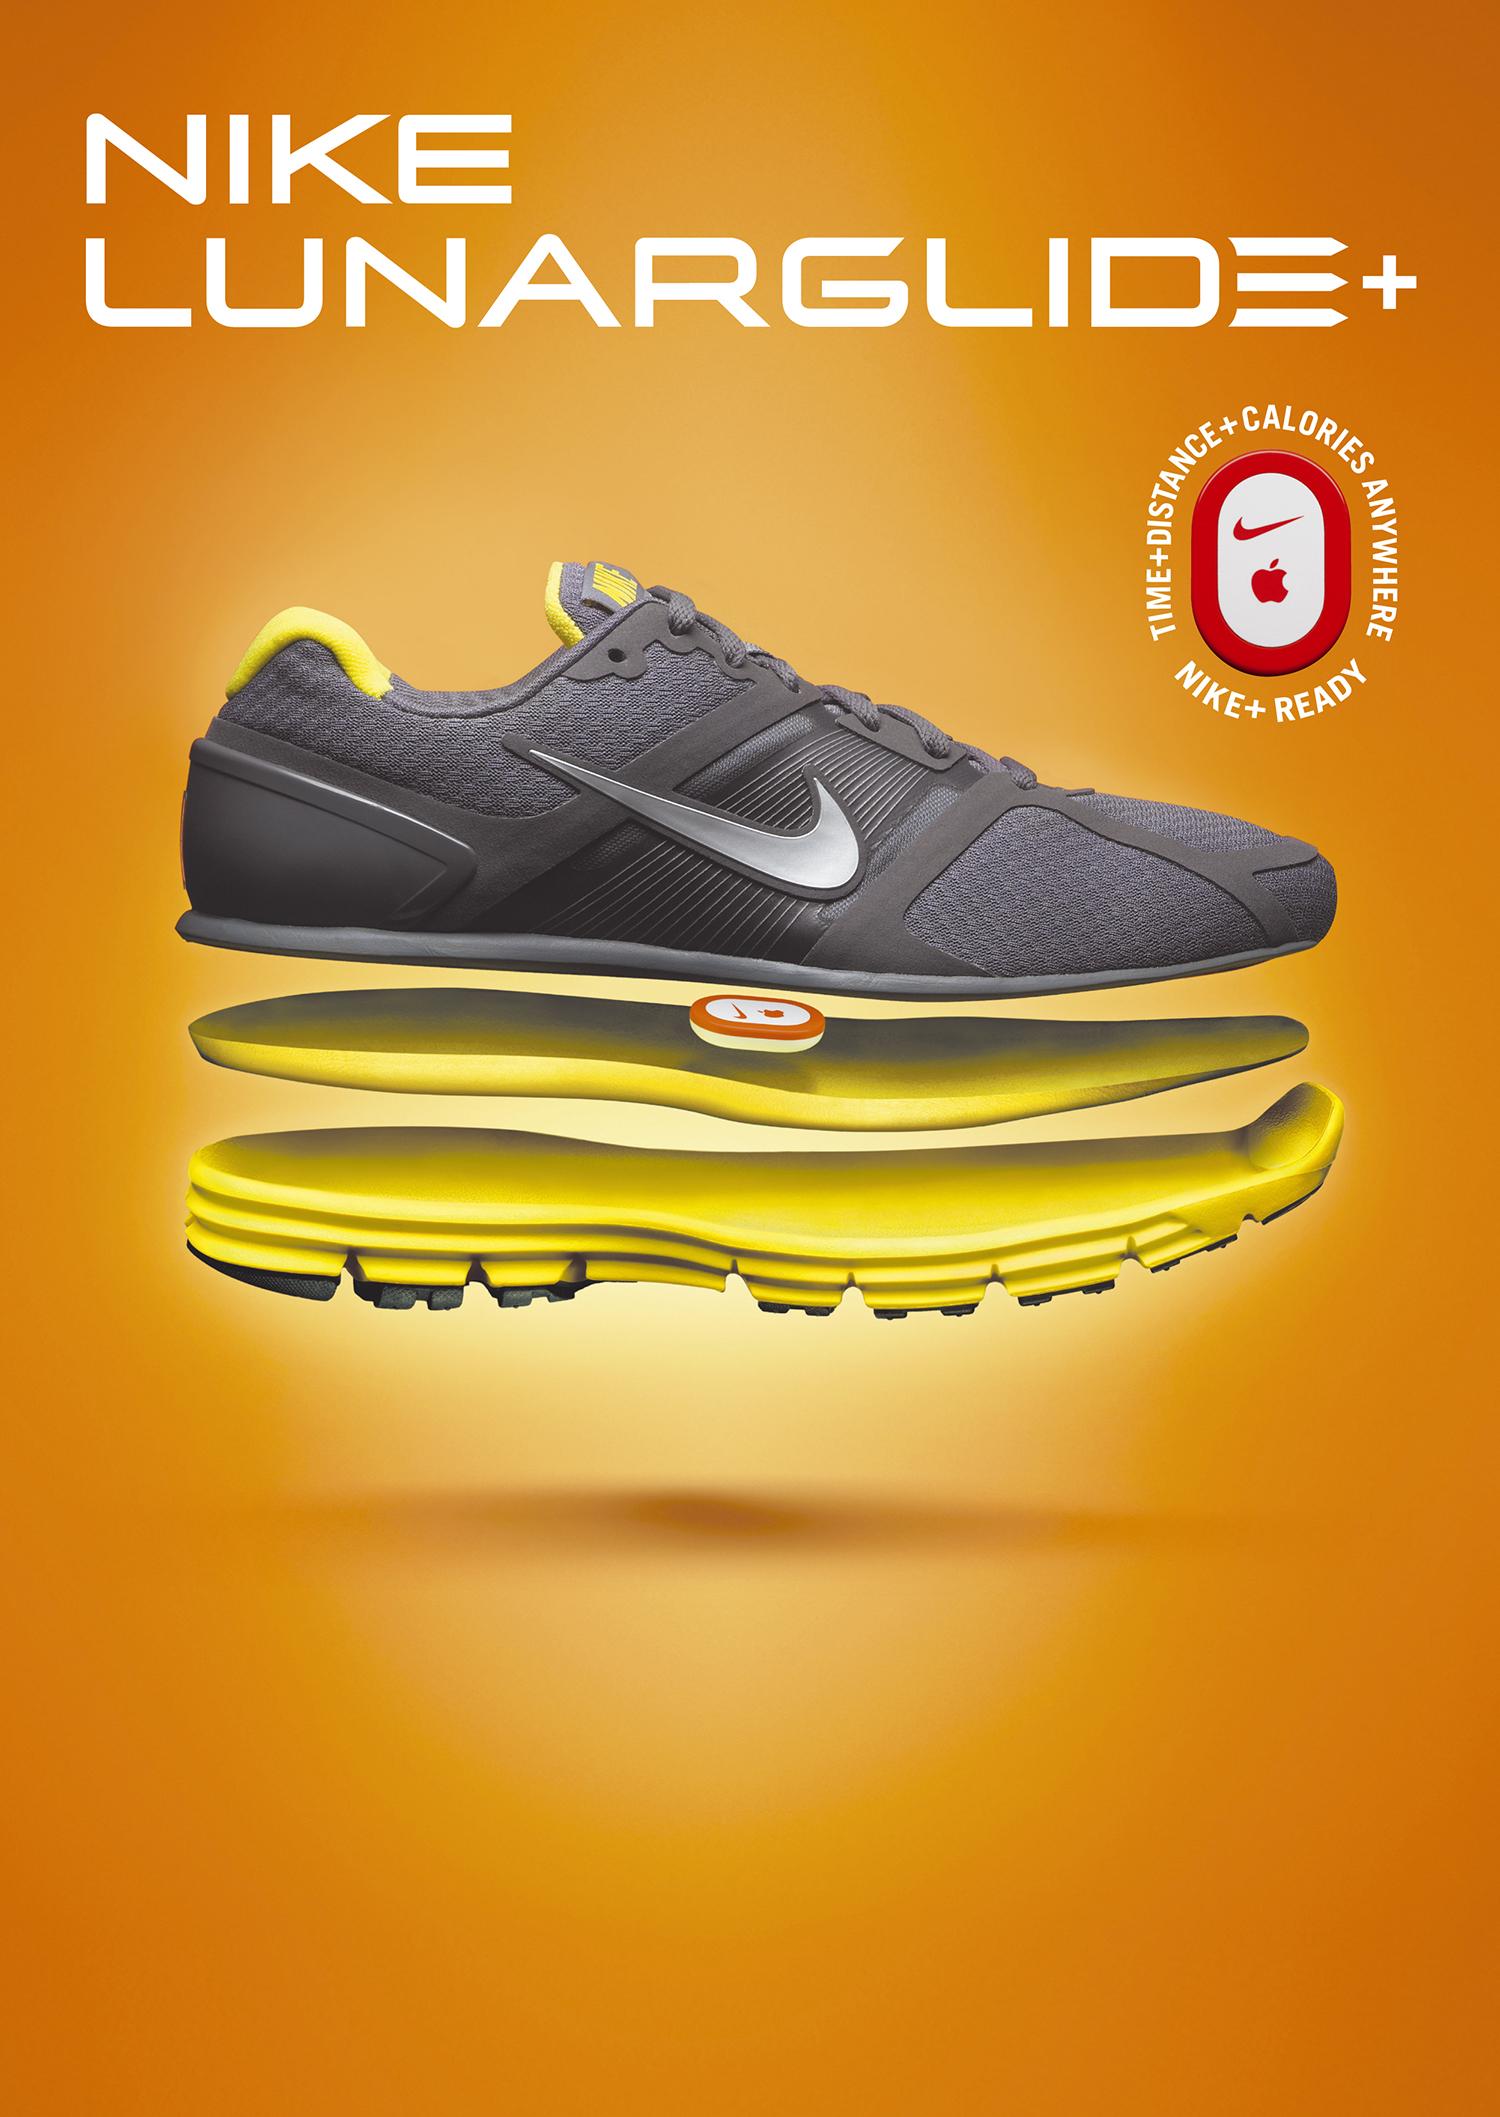 Brandee_Nike Lunarglide A4 silo_generic_HR.jpg